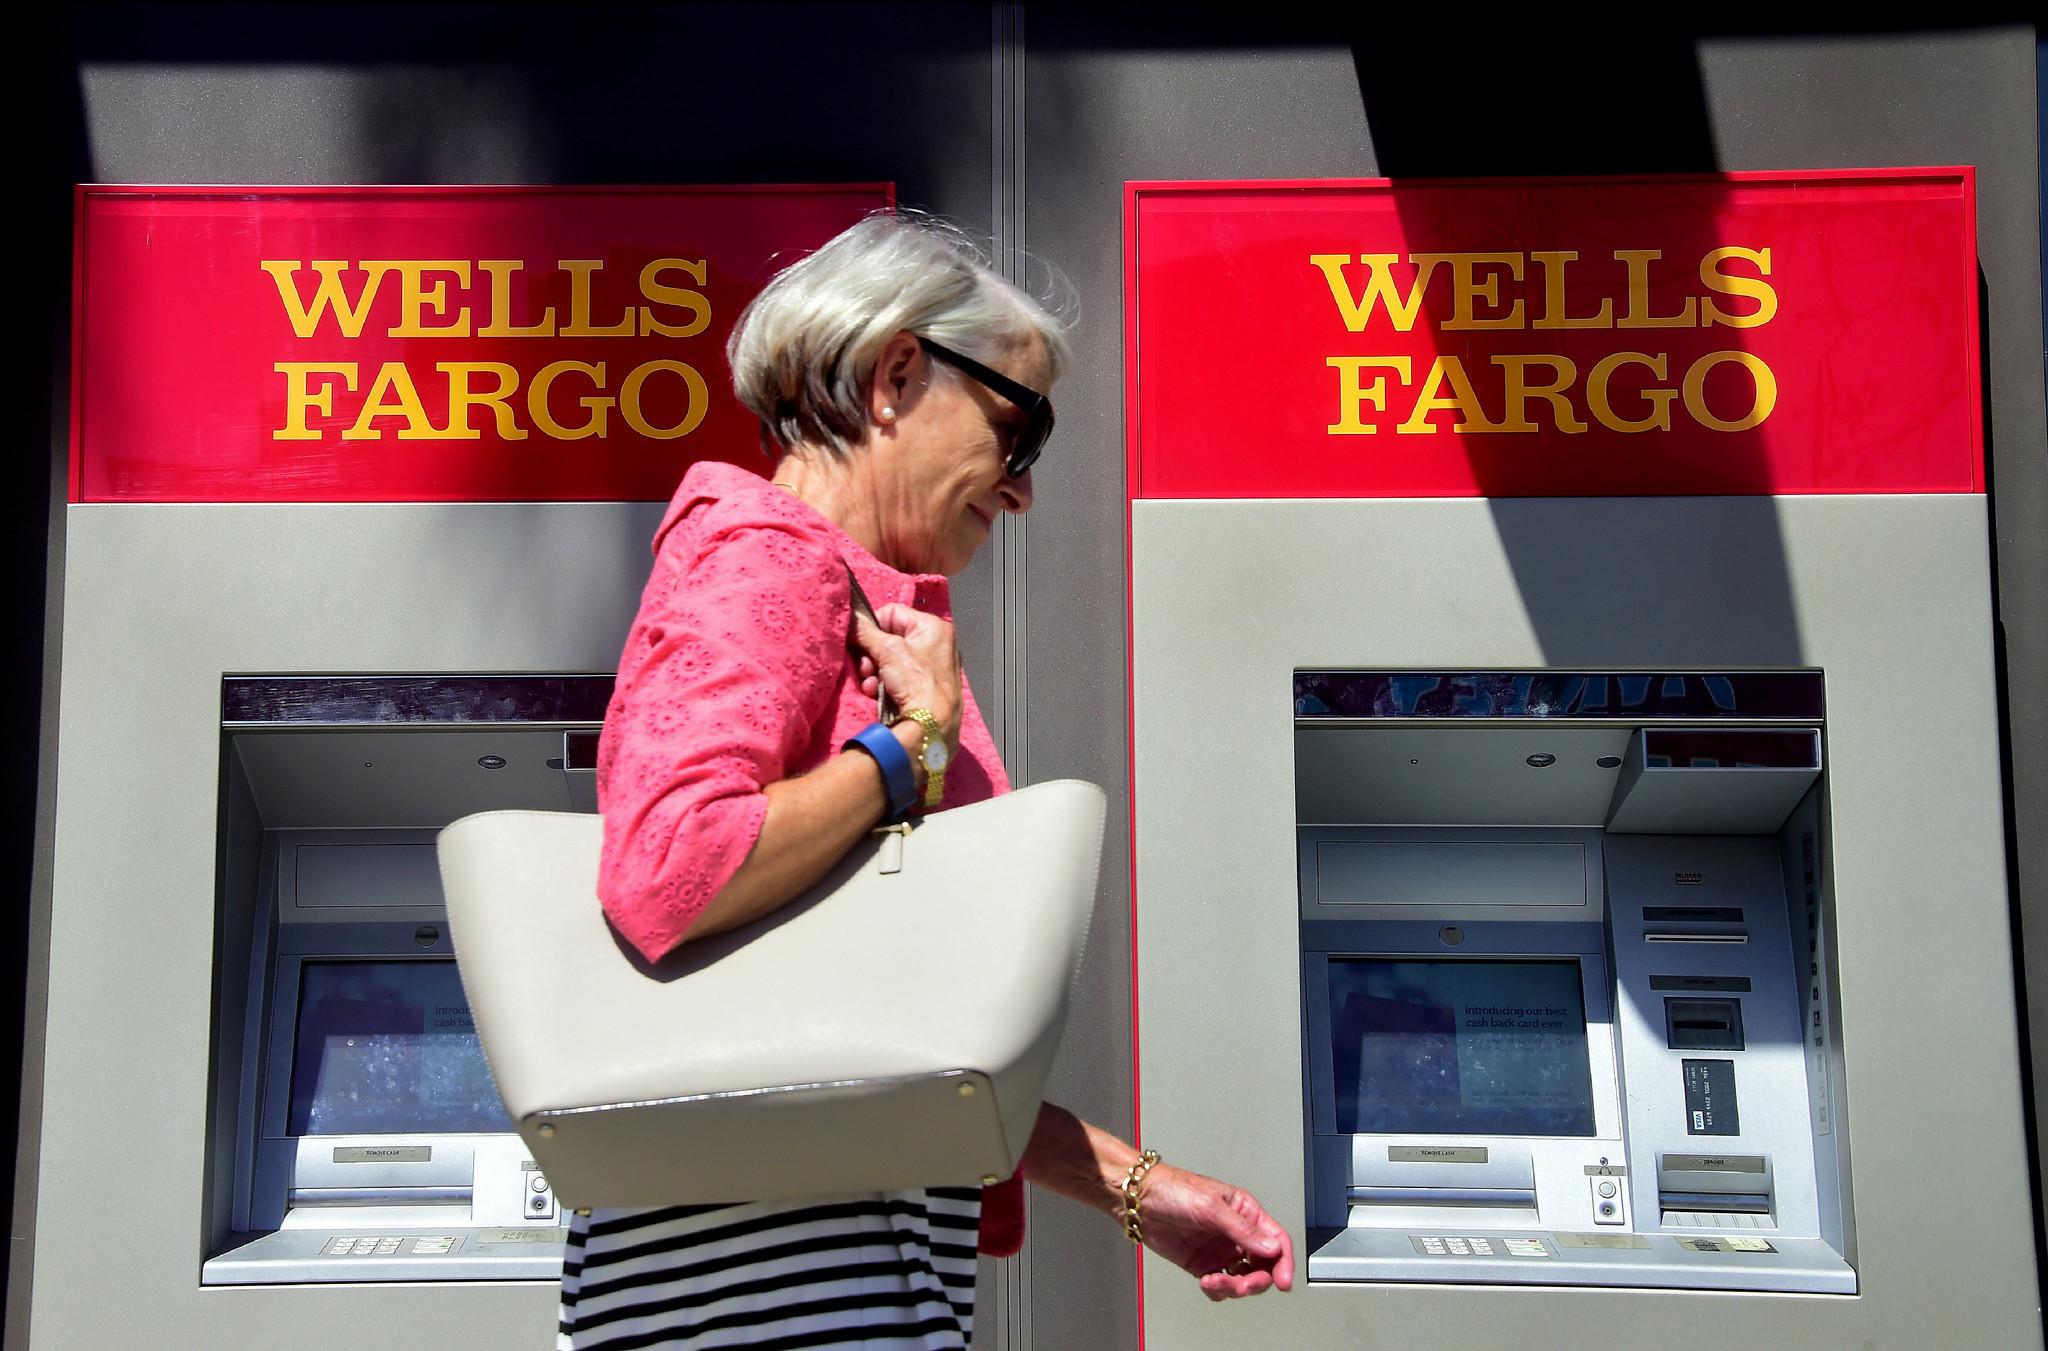 Wells Fargo Quarterly Earnings Fall In Wake Of Bogus Accounts